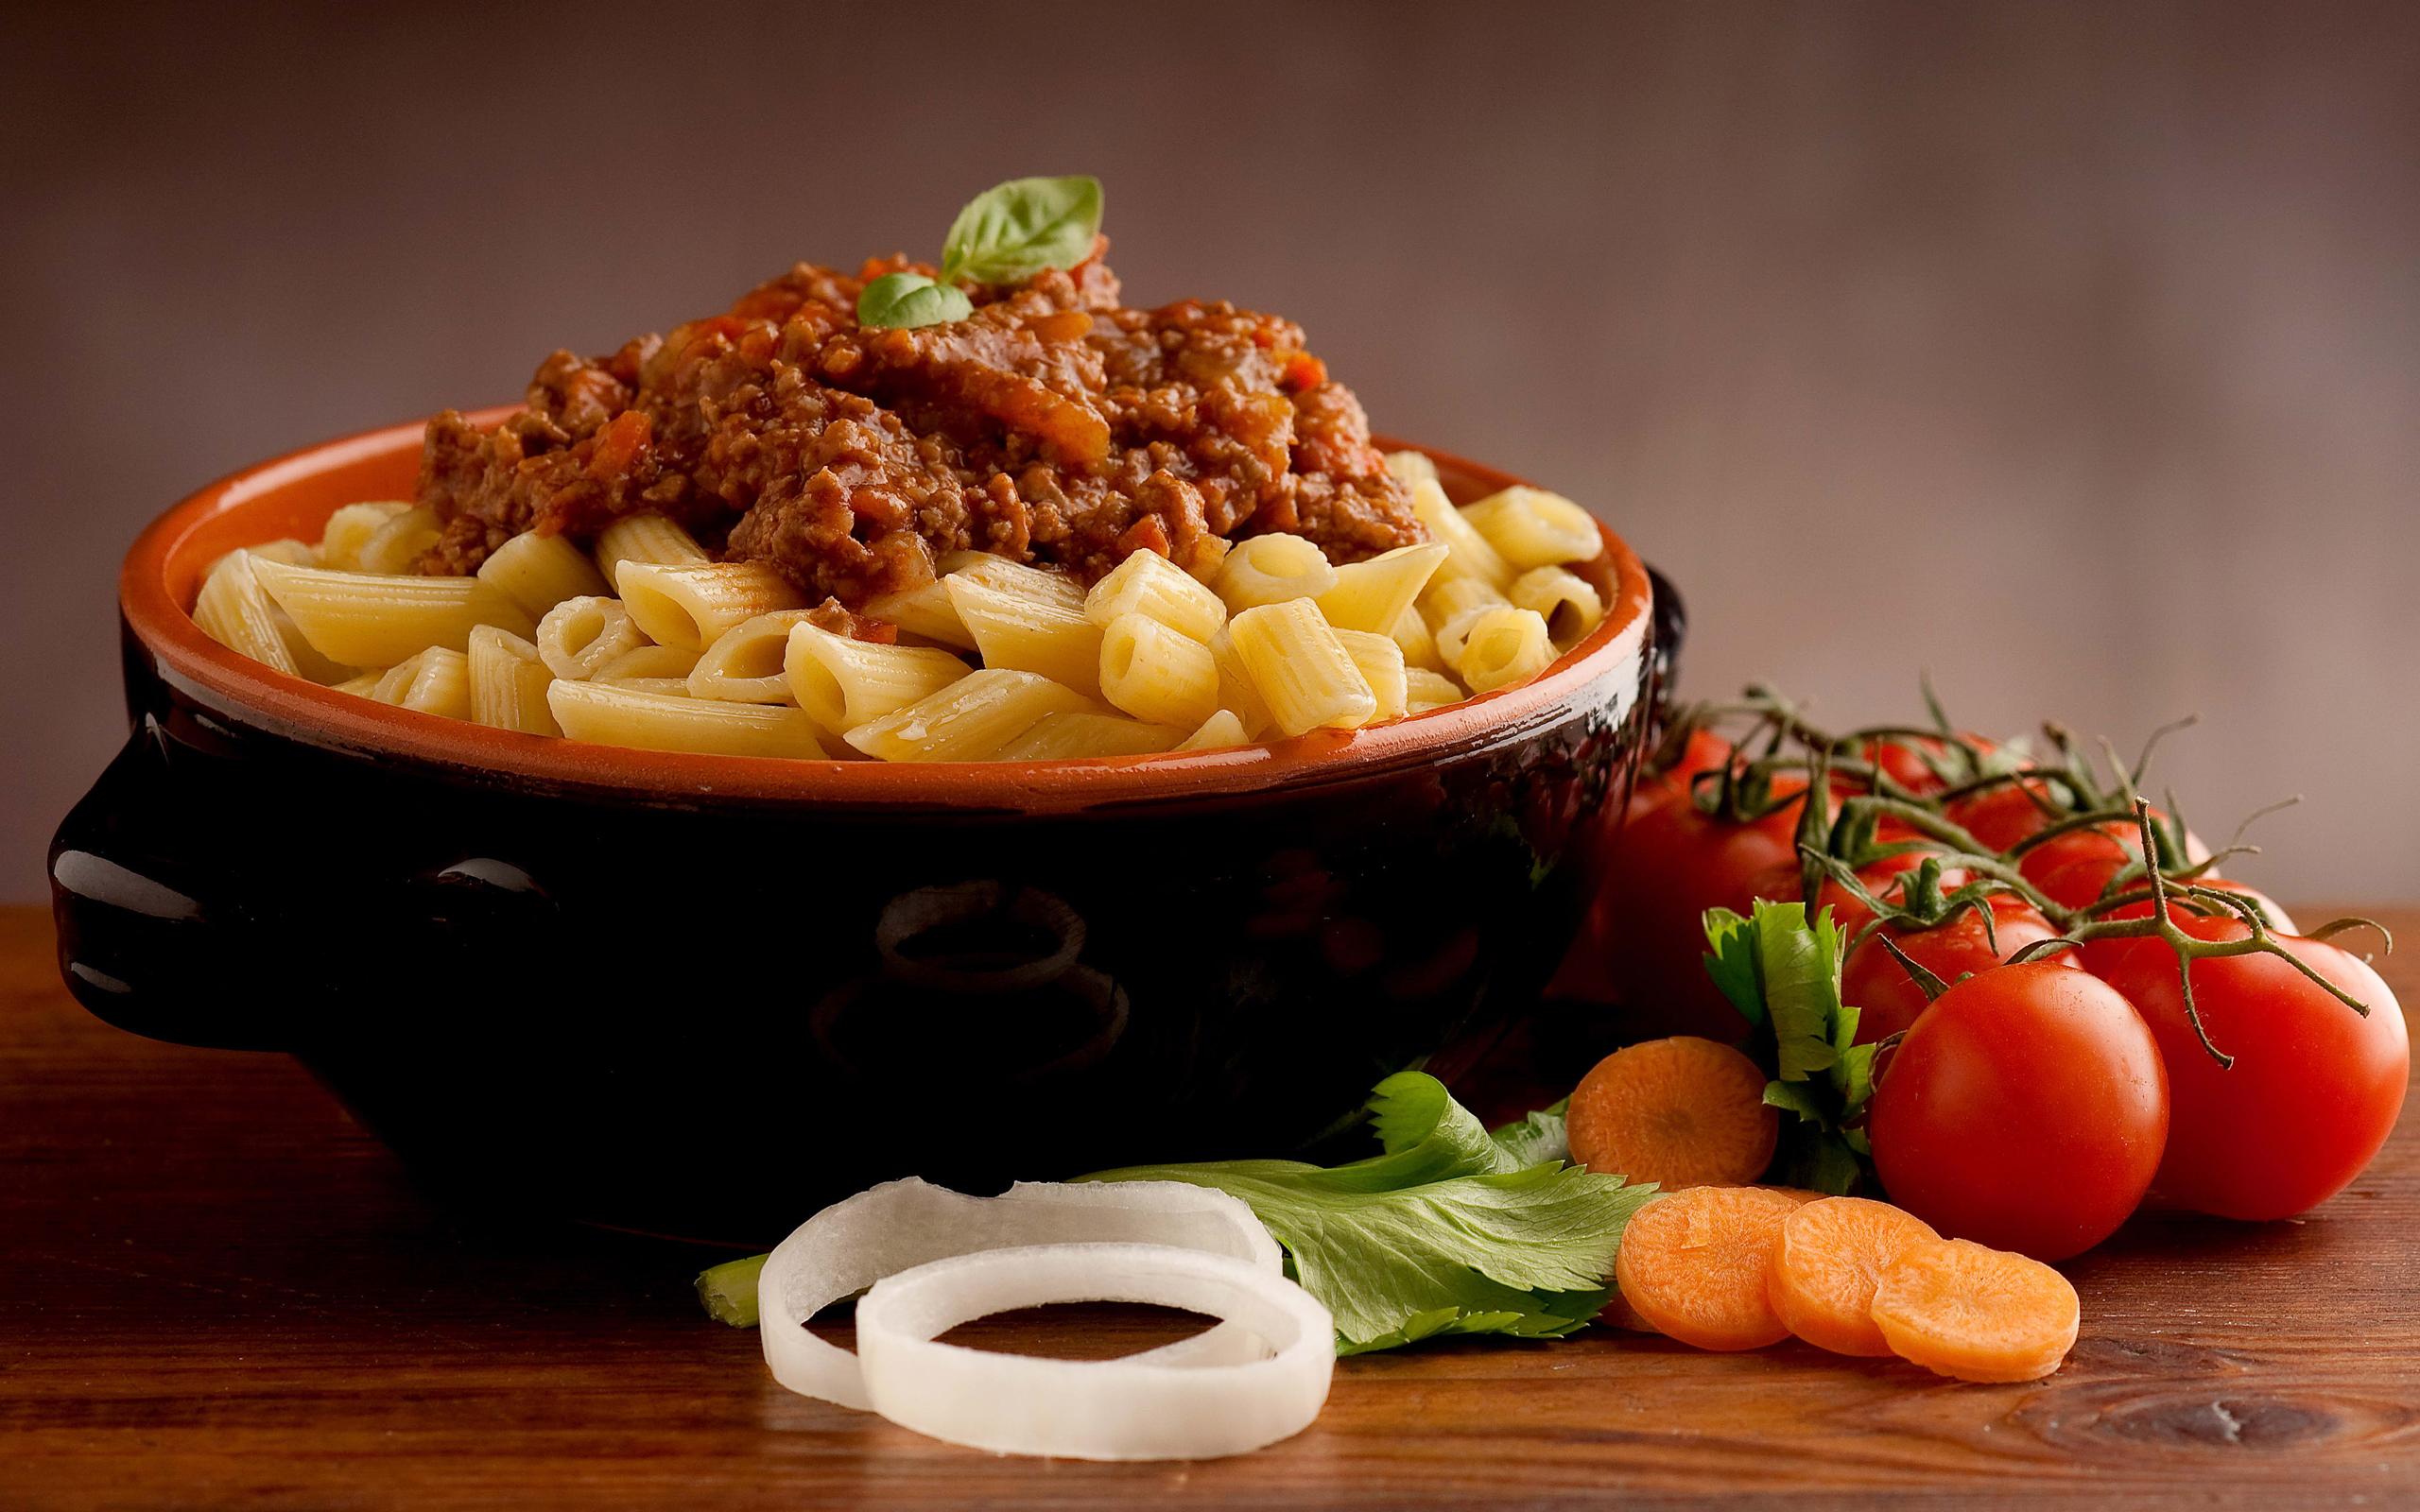 Pasta clipart italy food 7 pasta Italian Widescreen